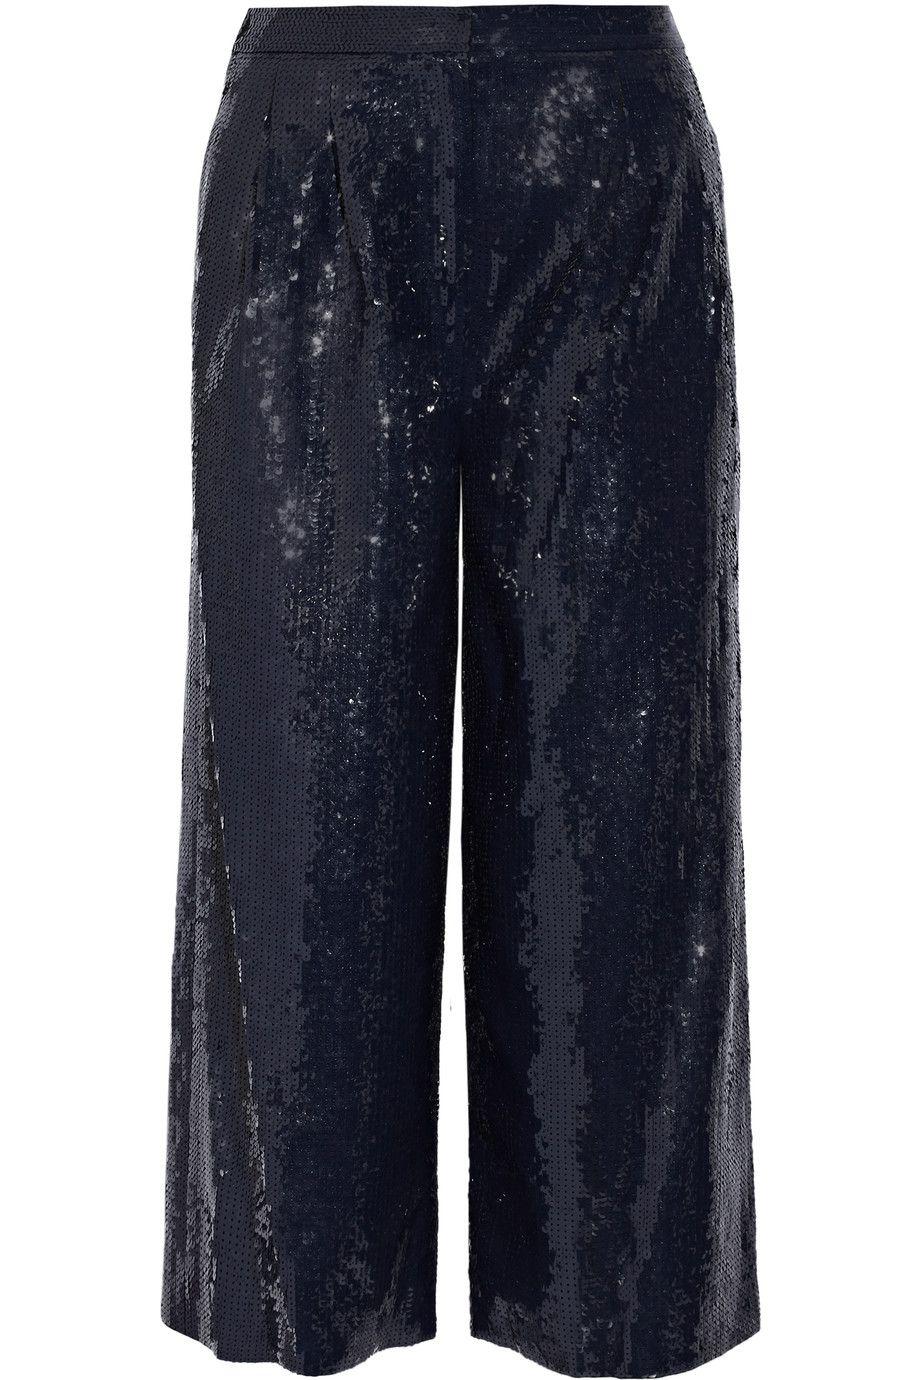 TIBI Nerd Cropped Sequined Crepe Wide-Leg Pants. #tibi #cloth #pants